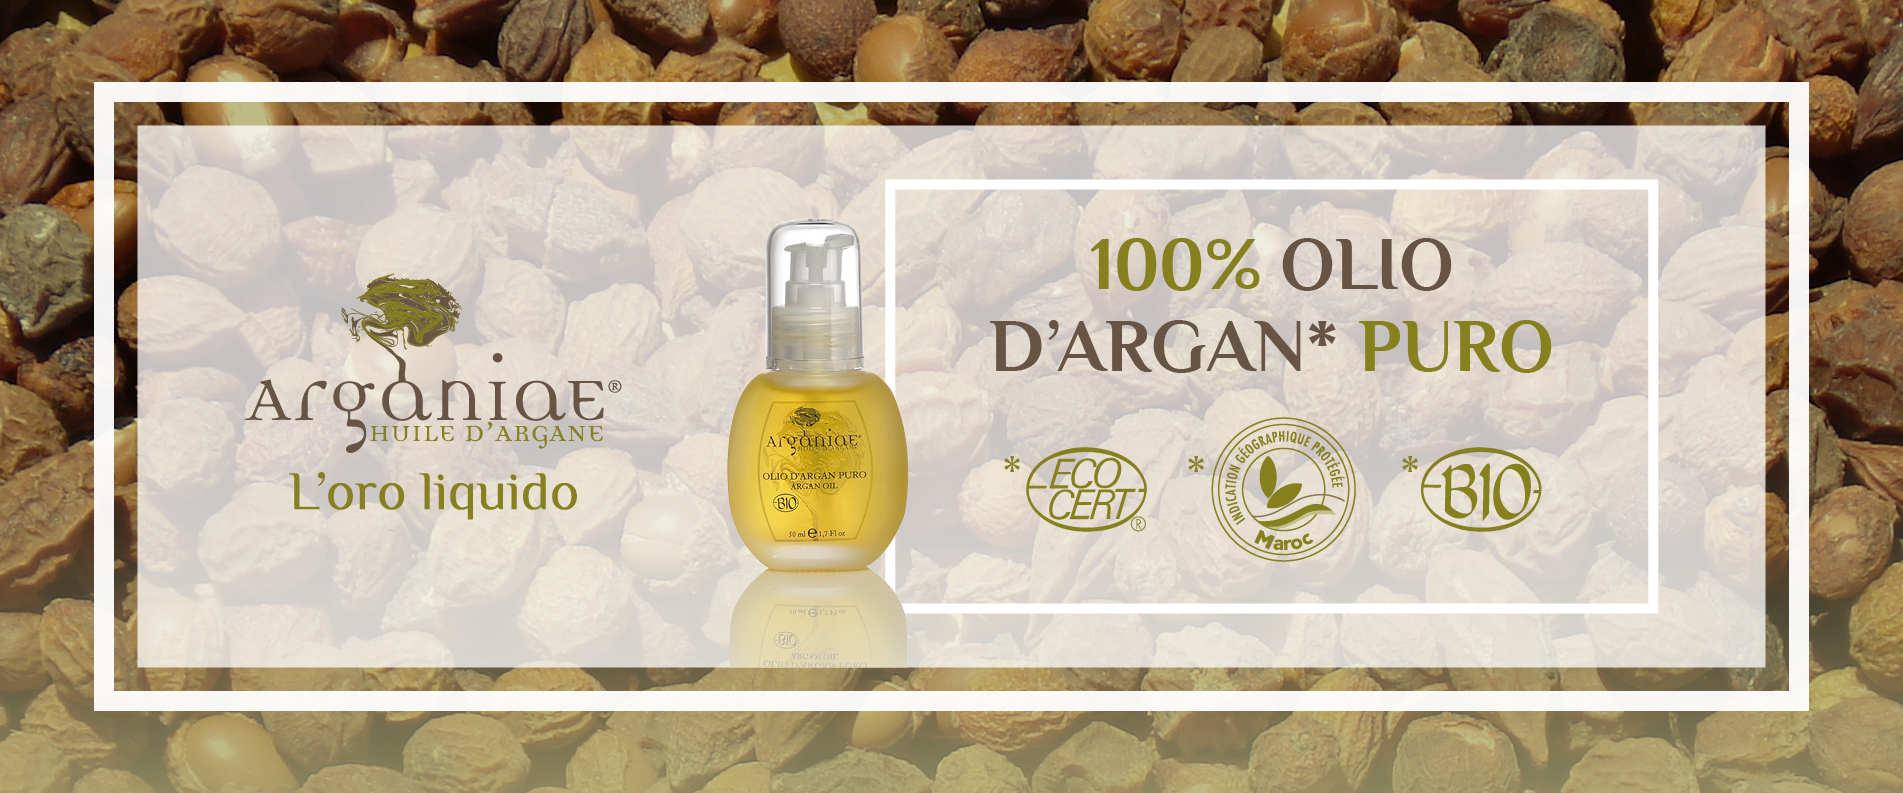 L'Olio di argan di Arganiae